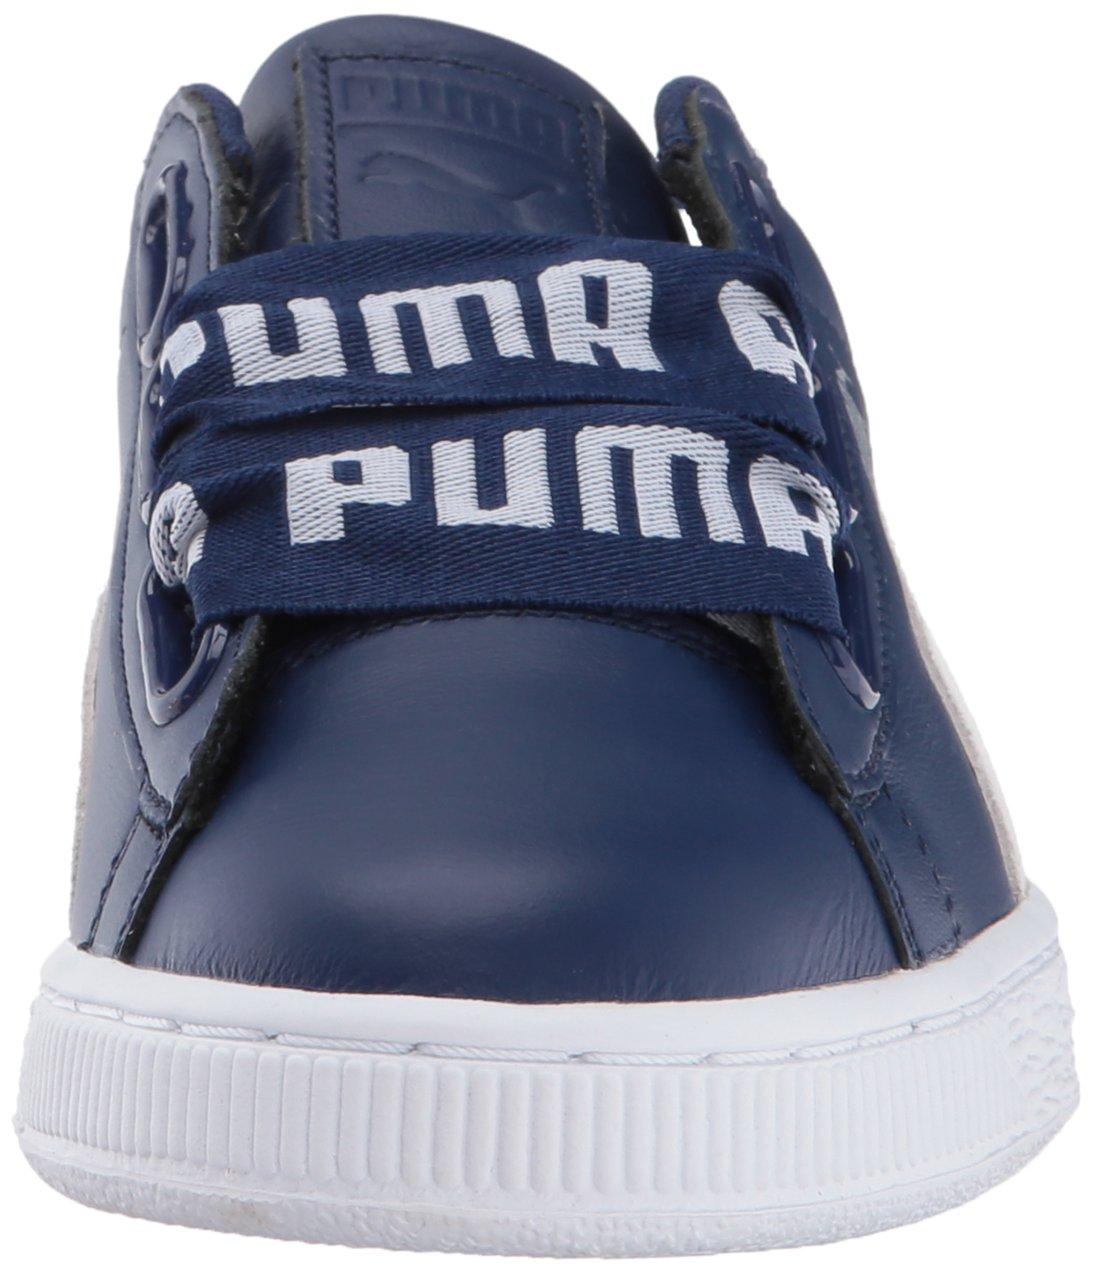 PUMA 6 Women s Basket Heart DE Wn Sneaker B01MZ0E060 6 PUMA M US ... ec83872e7